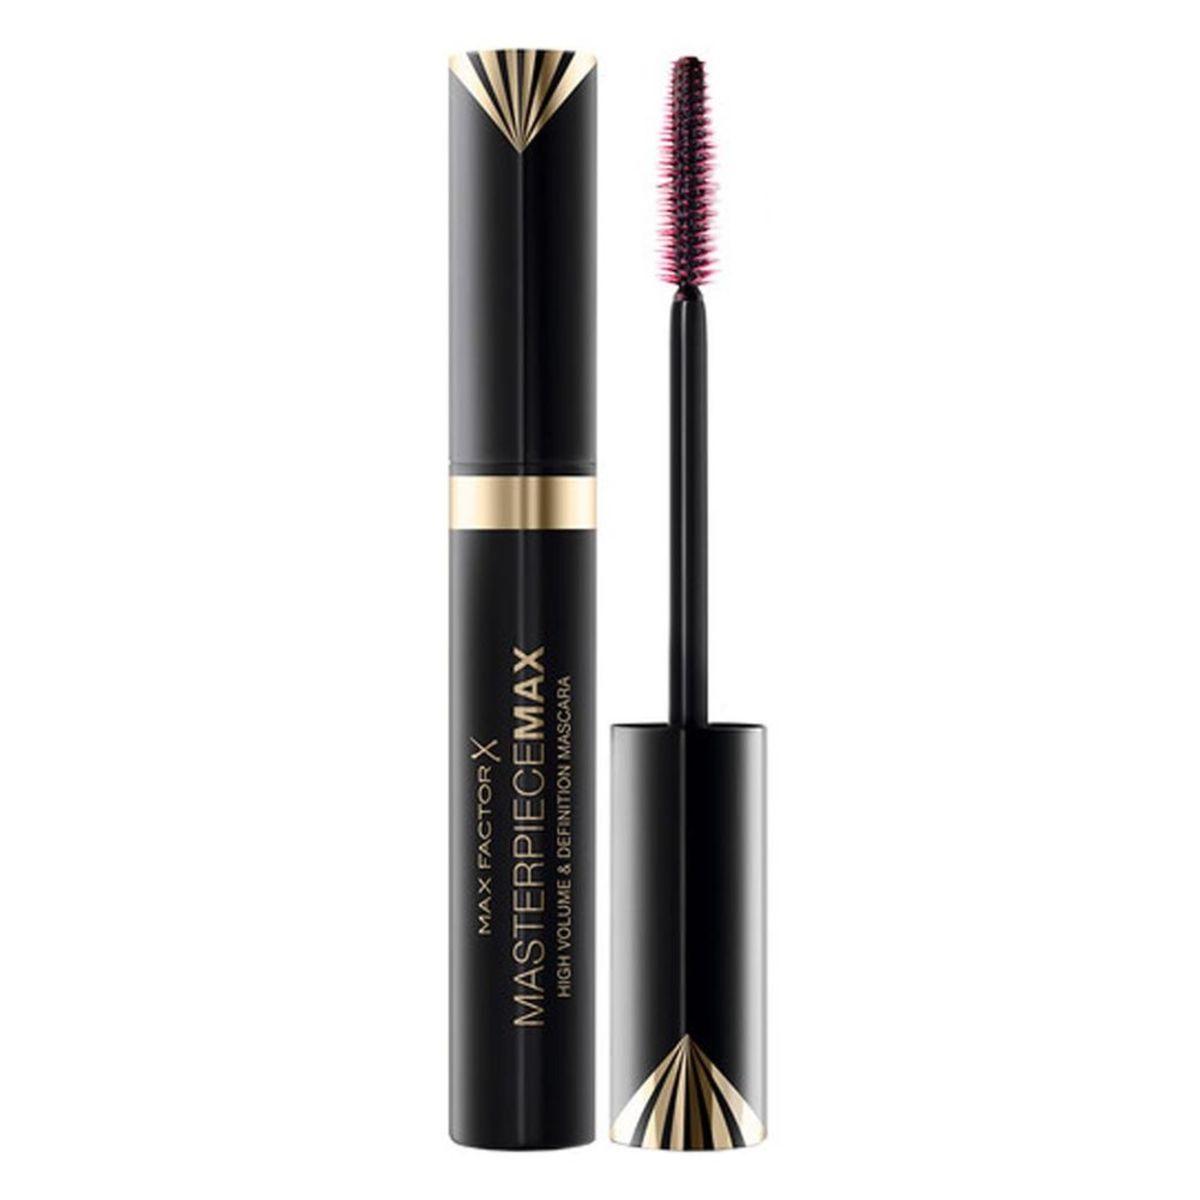 Mascara Masterpiece Max 7.2ml #Black [Parallel Import Product](Black+Gold)